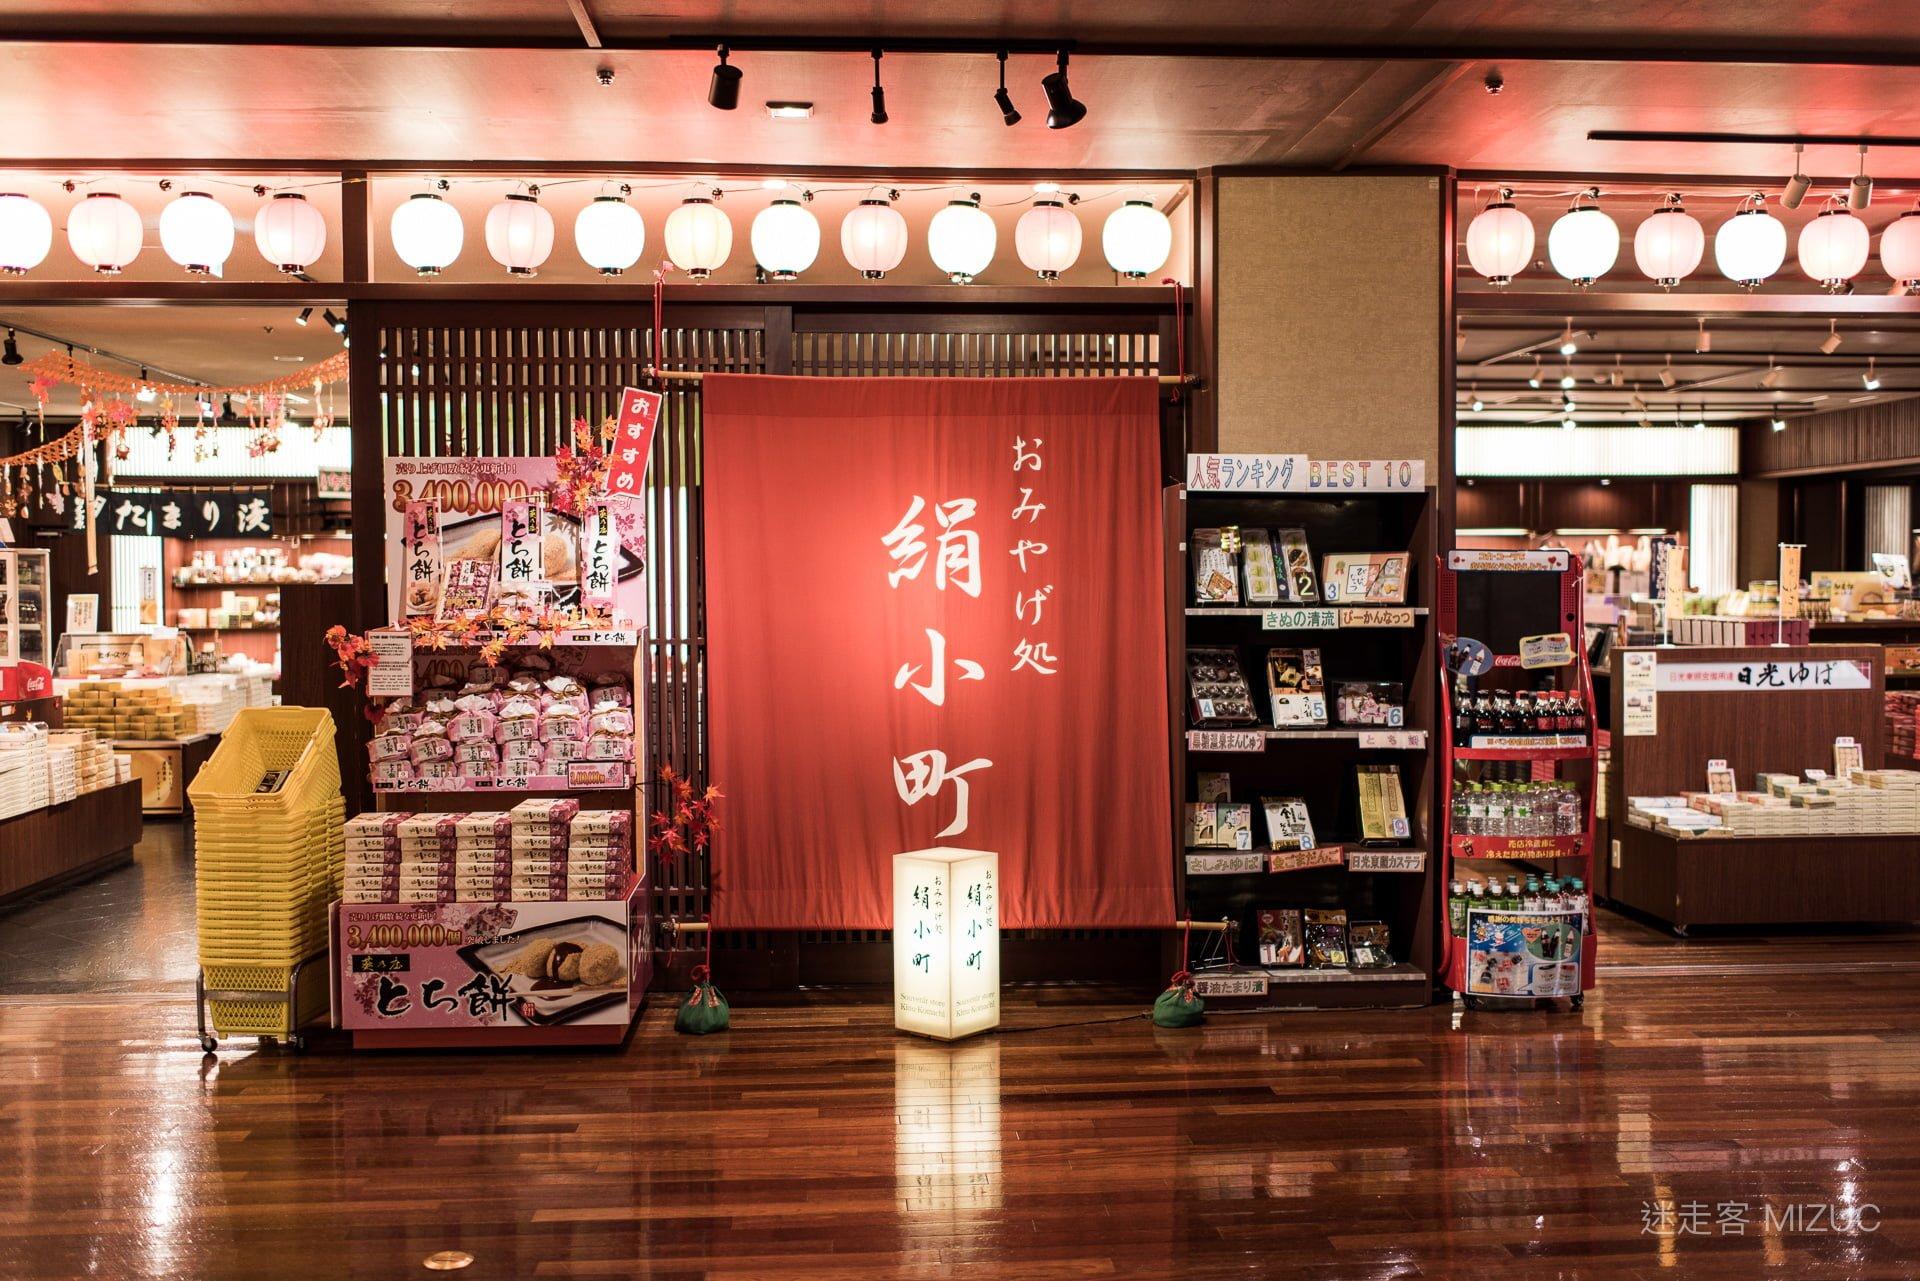 201711 Ibaraki Tochigi Gunma Japan Travel By RentalCar 44 日本自駕旅遊/北關東三縣「茨城、櫪木、群馬」秋天美食、溫泉與瀑布秘境百景(精選照片分享)